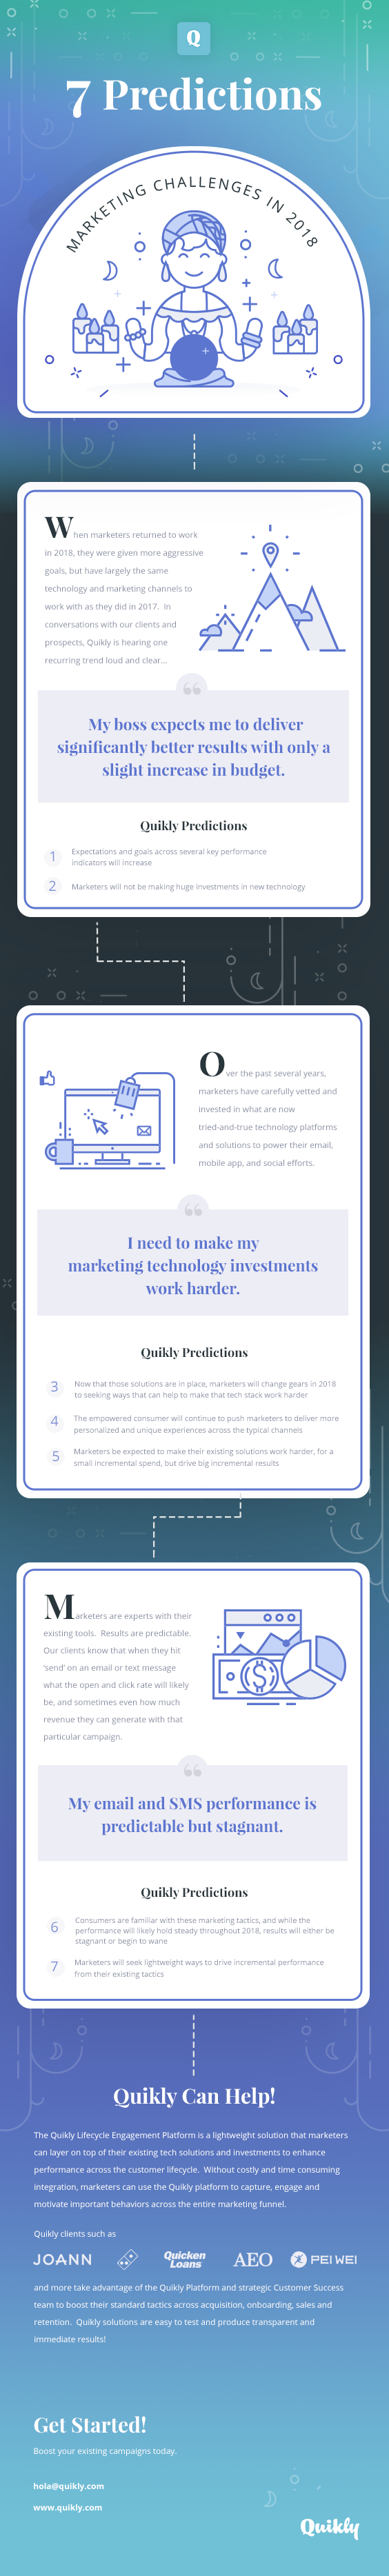 QuiklyPredictions_Inforgrapic.png